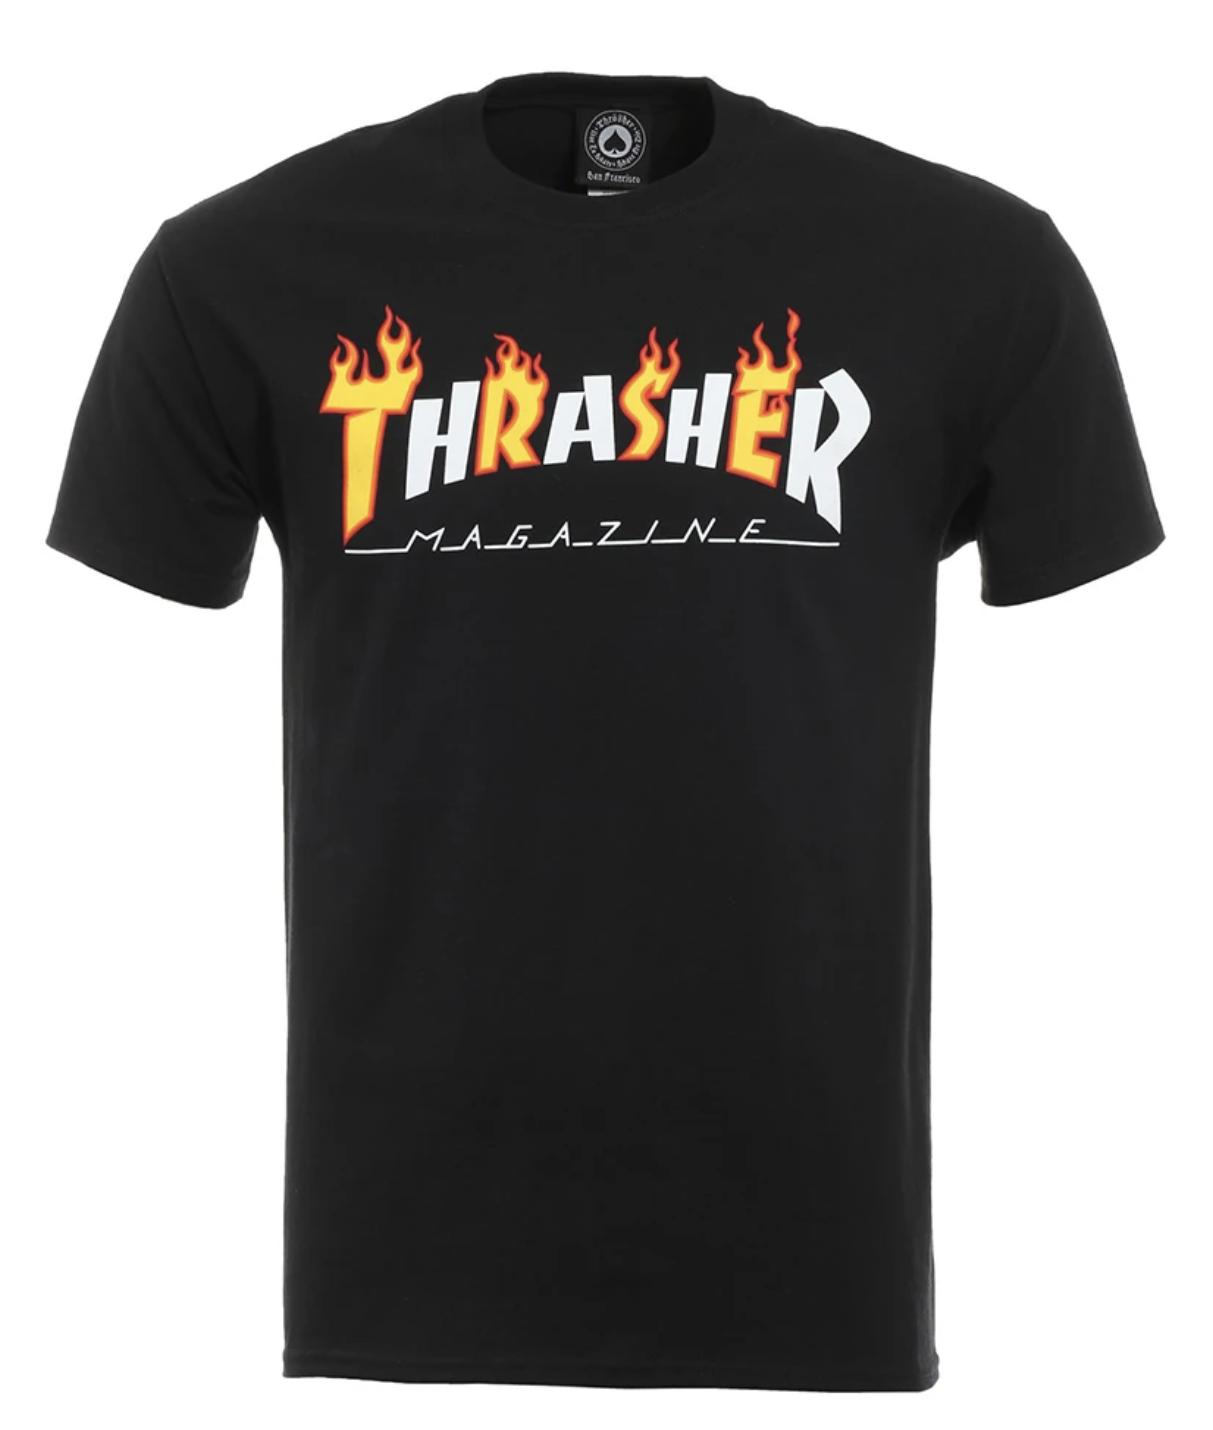 THRASHER T-SHIRT FLAME Black/White